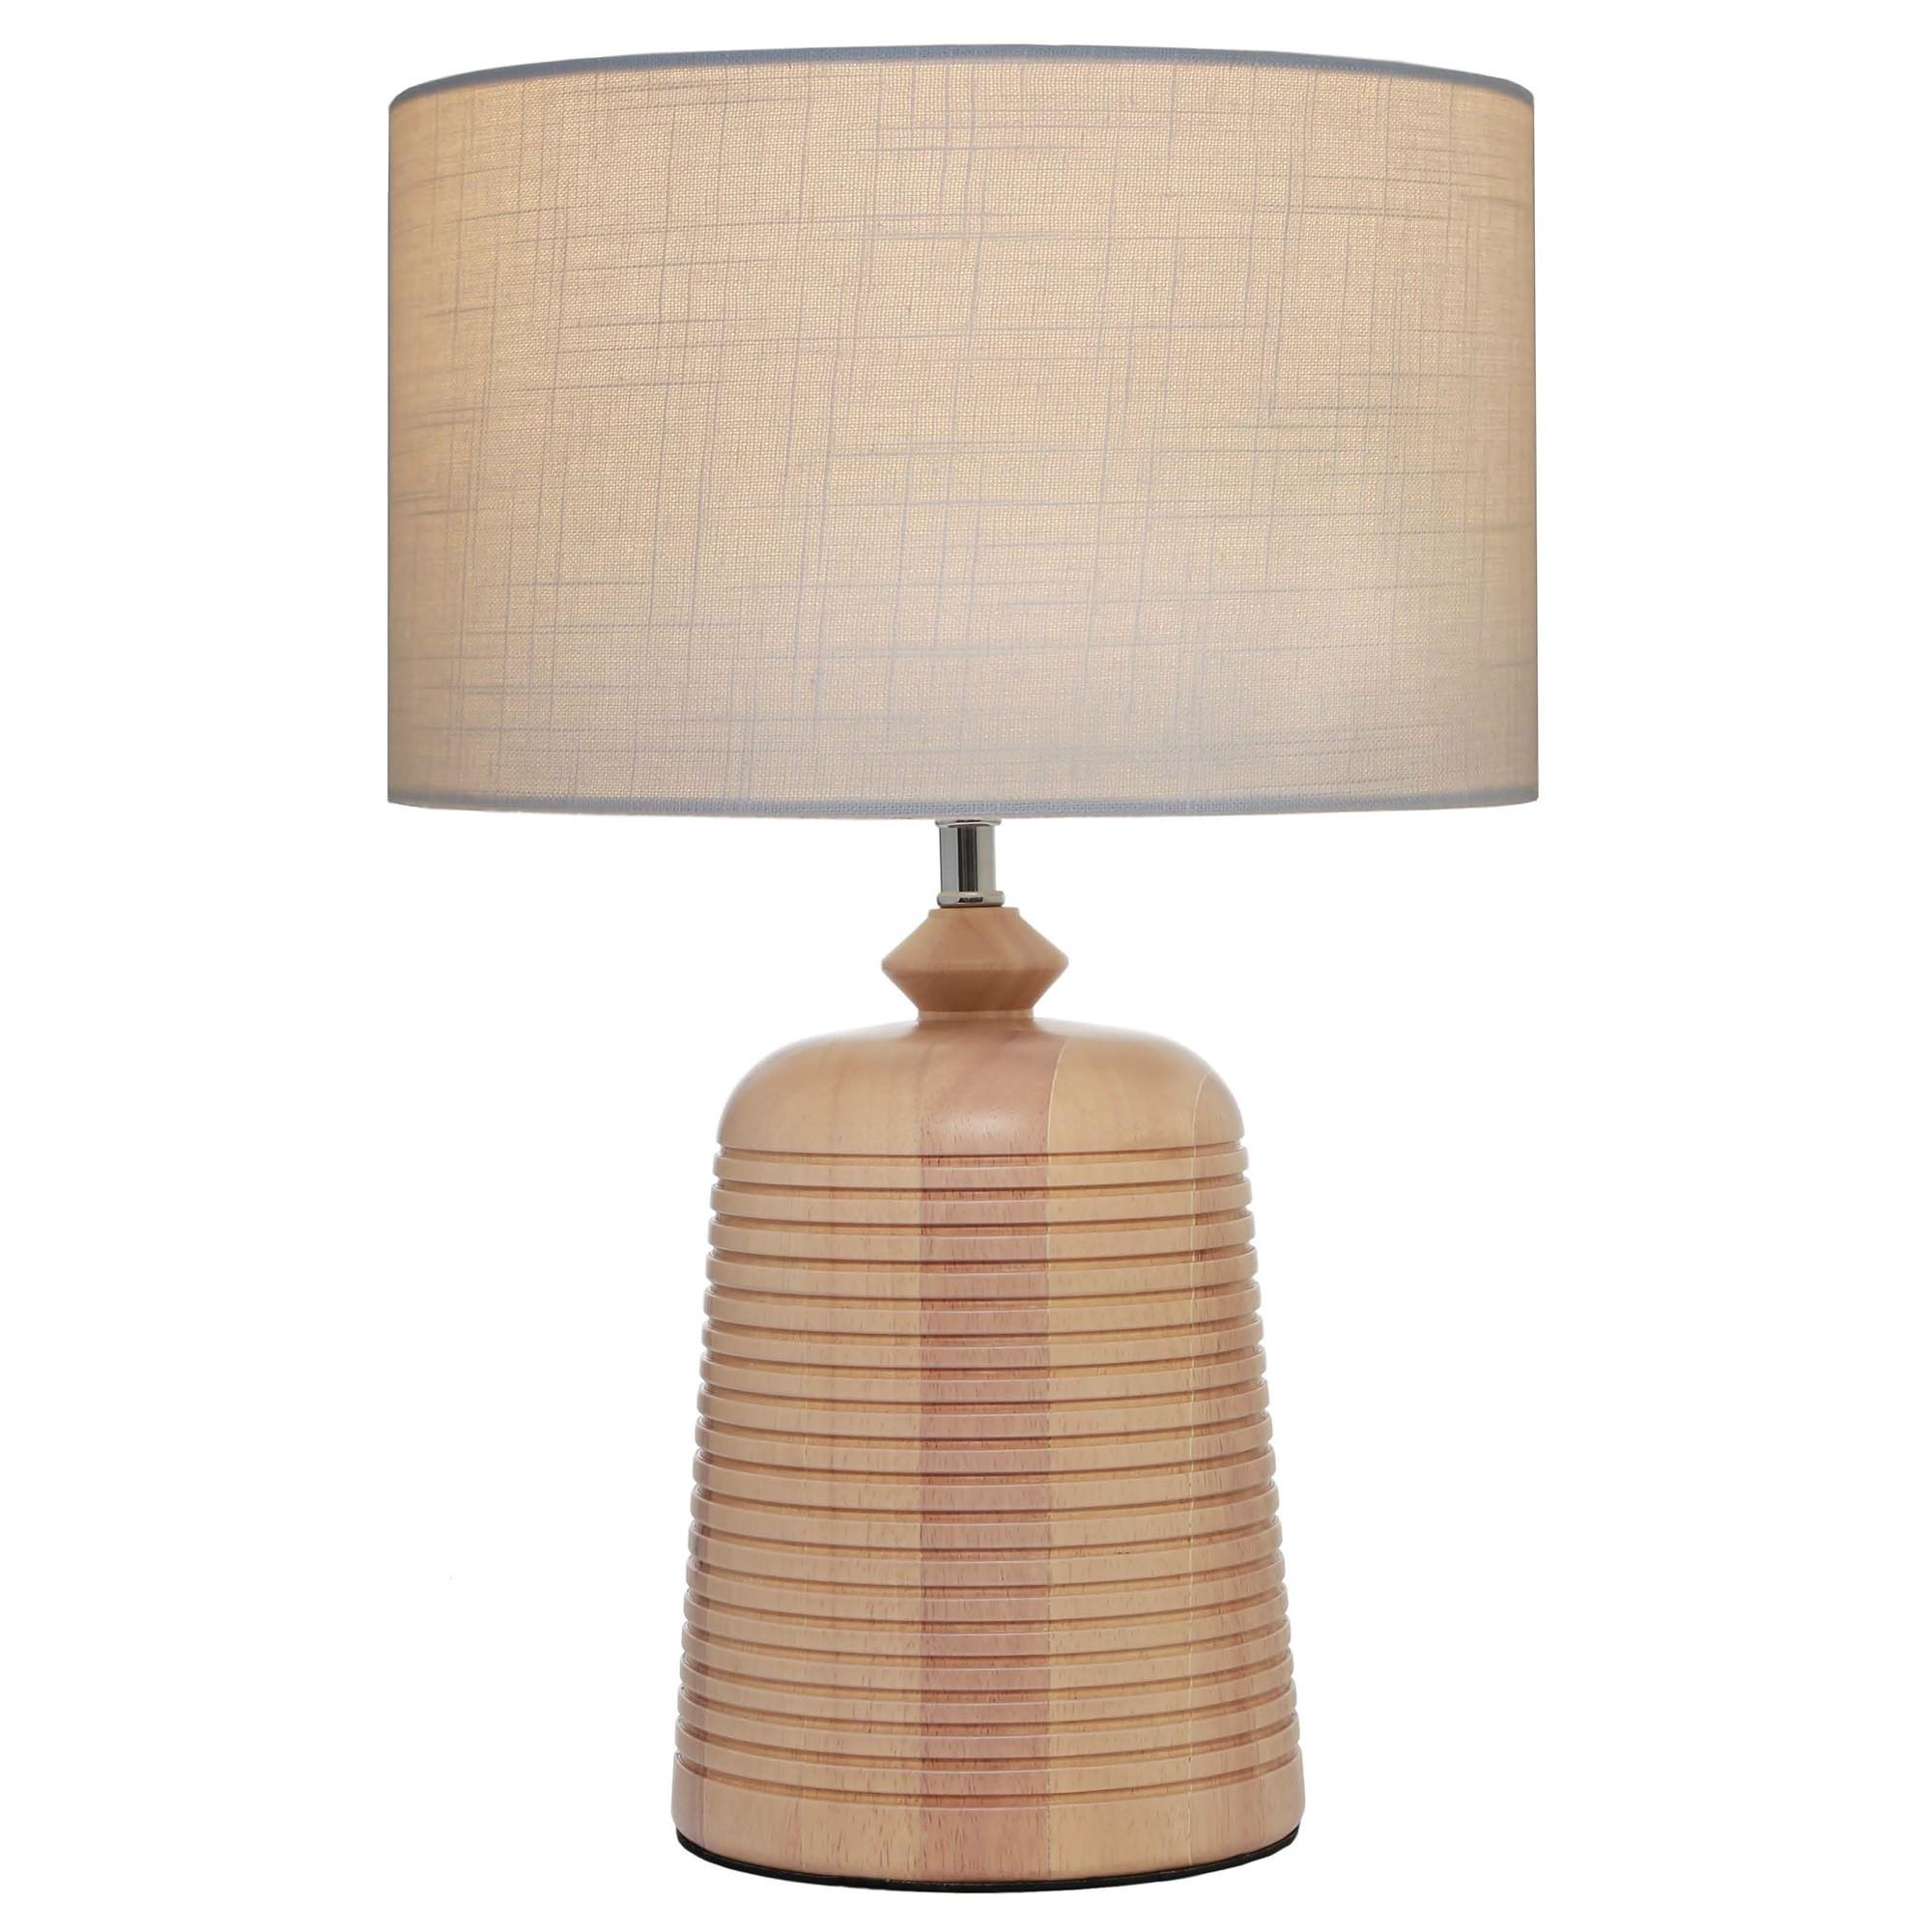 Eira Timber Base Table Lamp